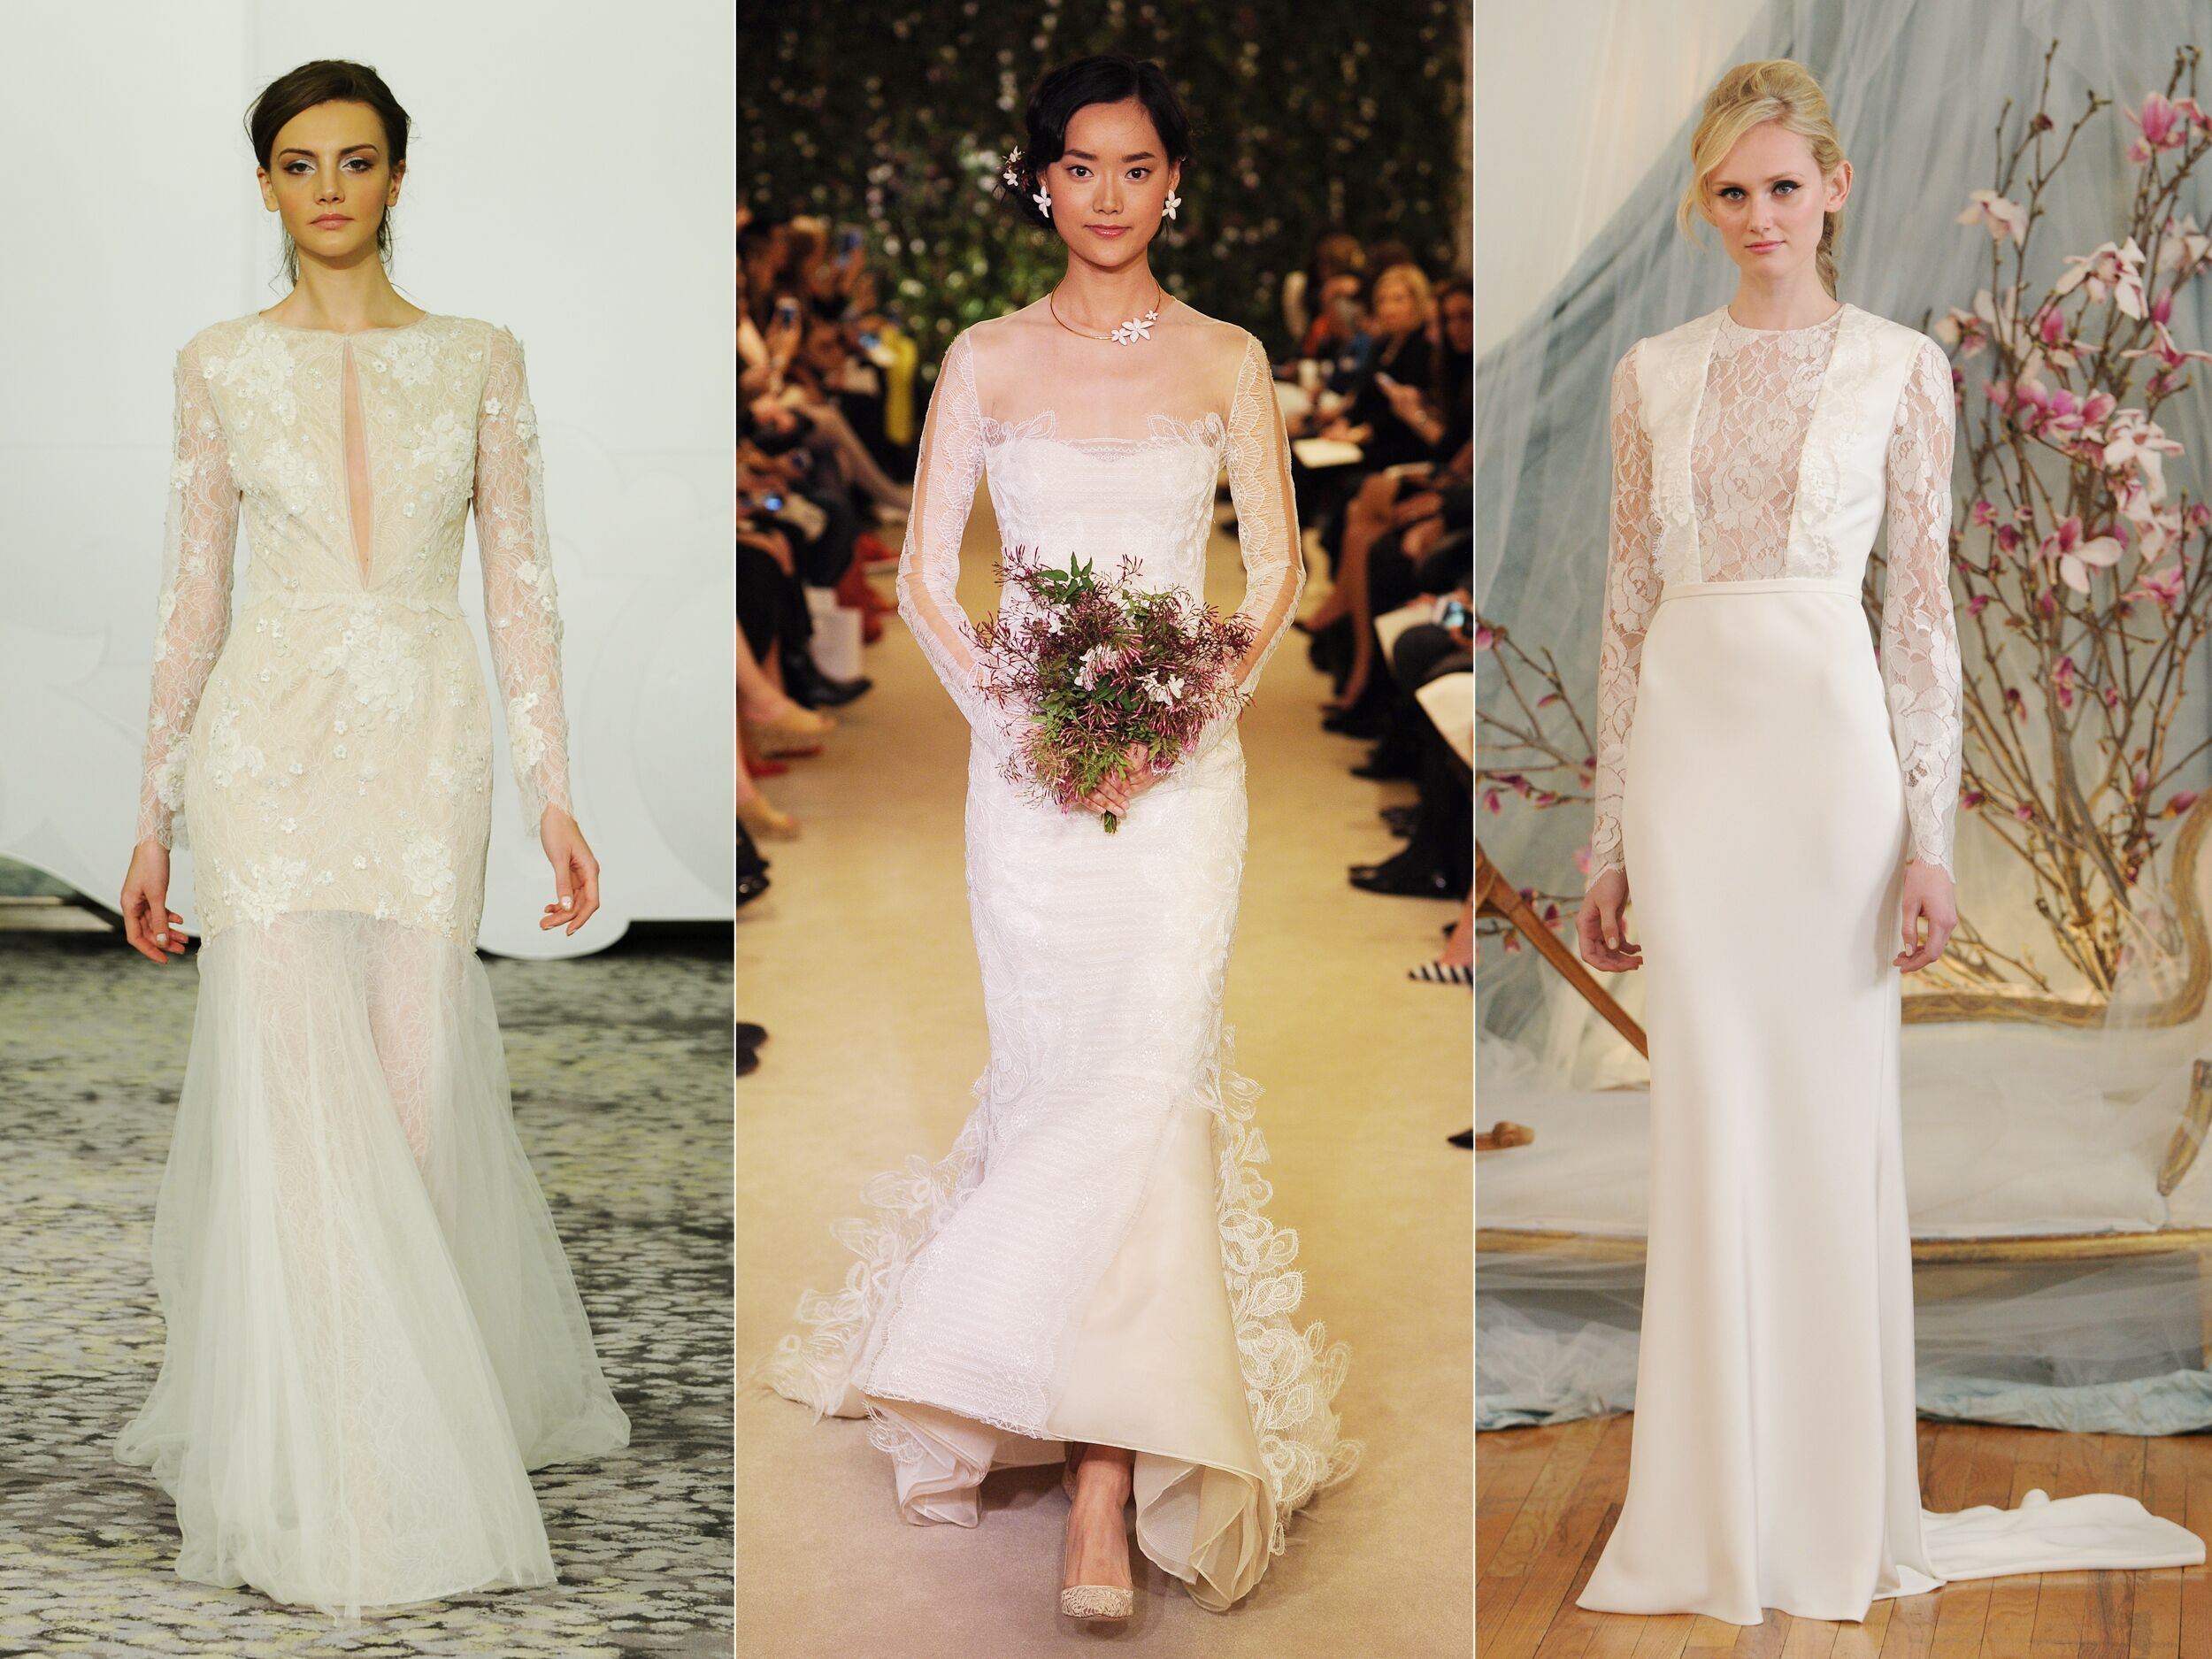 Beautiful Wedding Gowns: 15 Beautiful Long-Sleeved Wedding Dresses